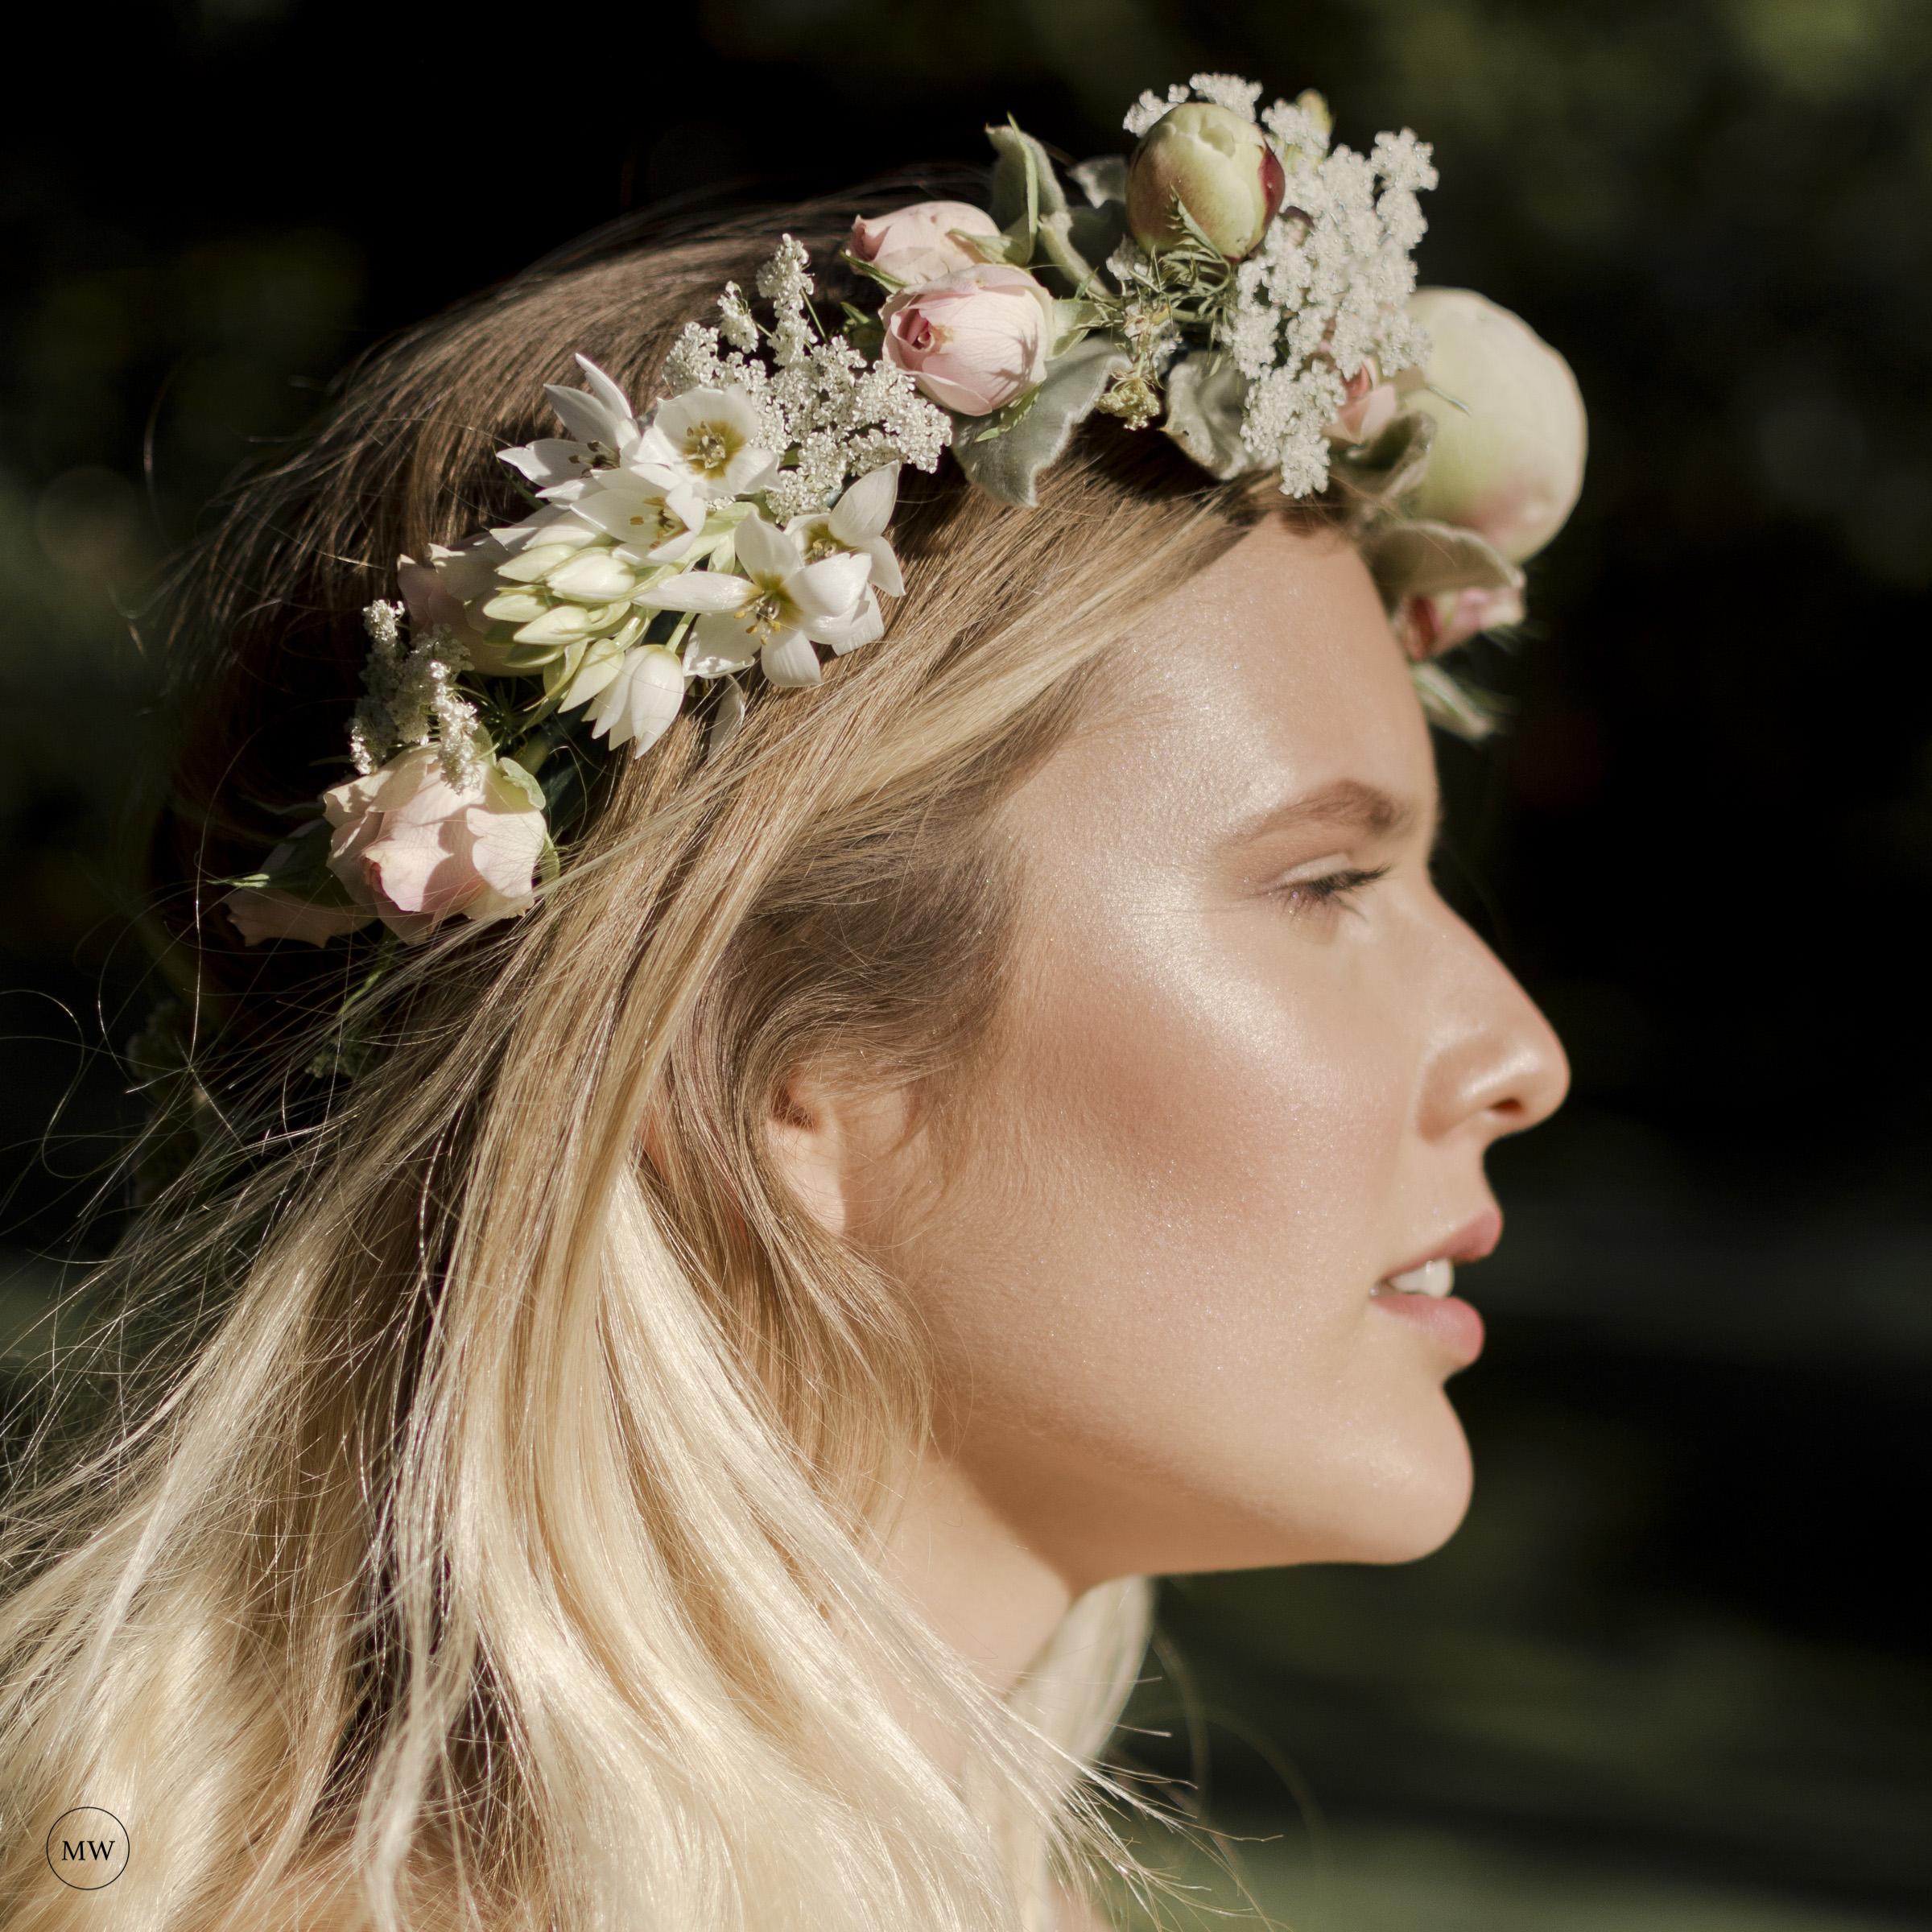 mayflower_wedding_photography_01-7.jpg